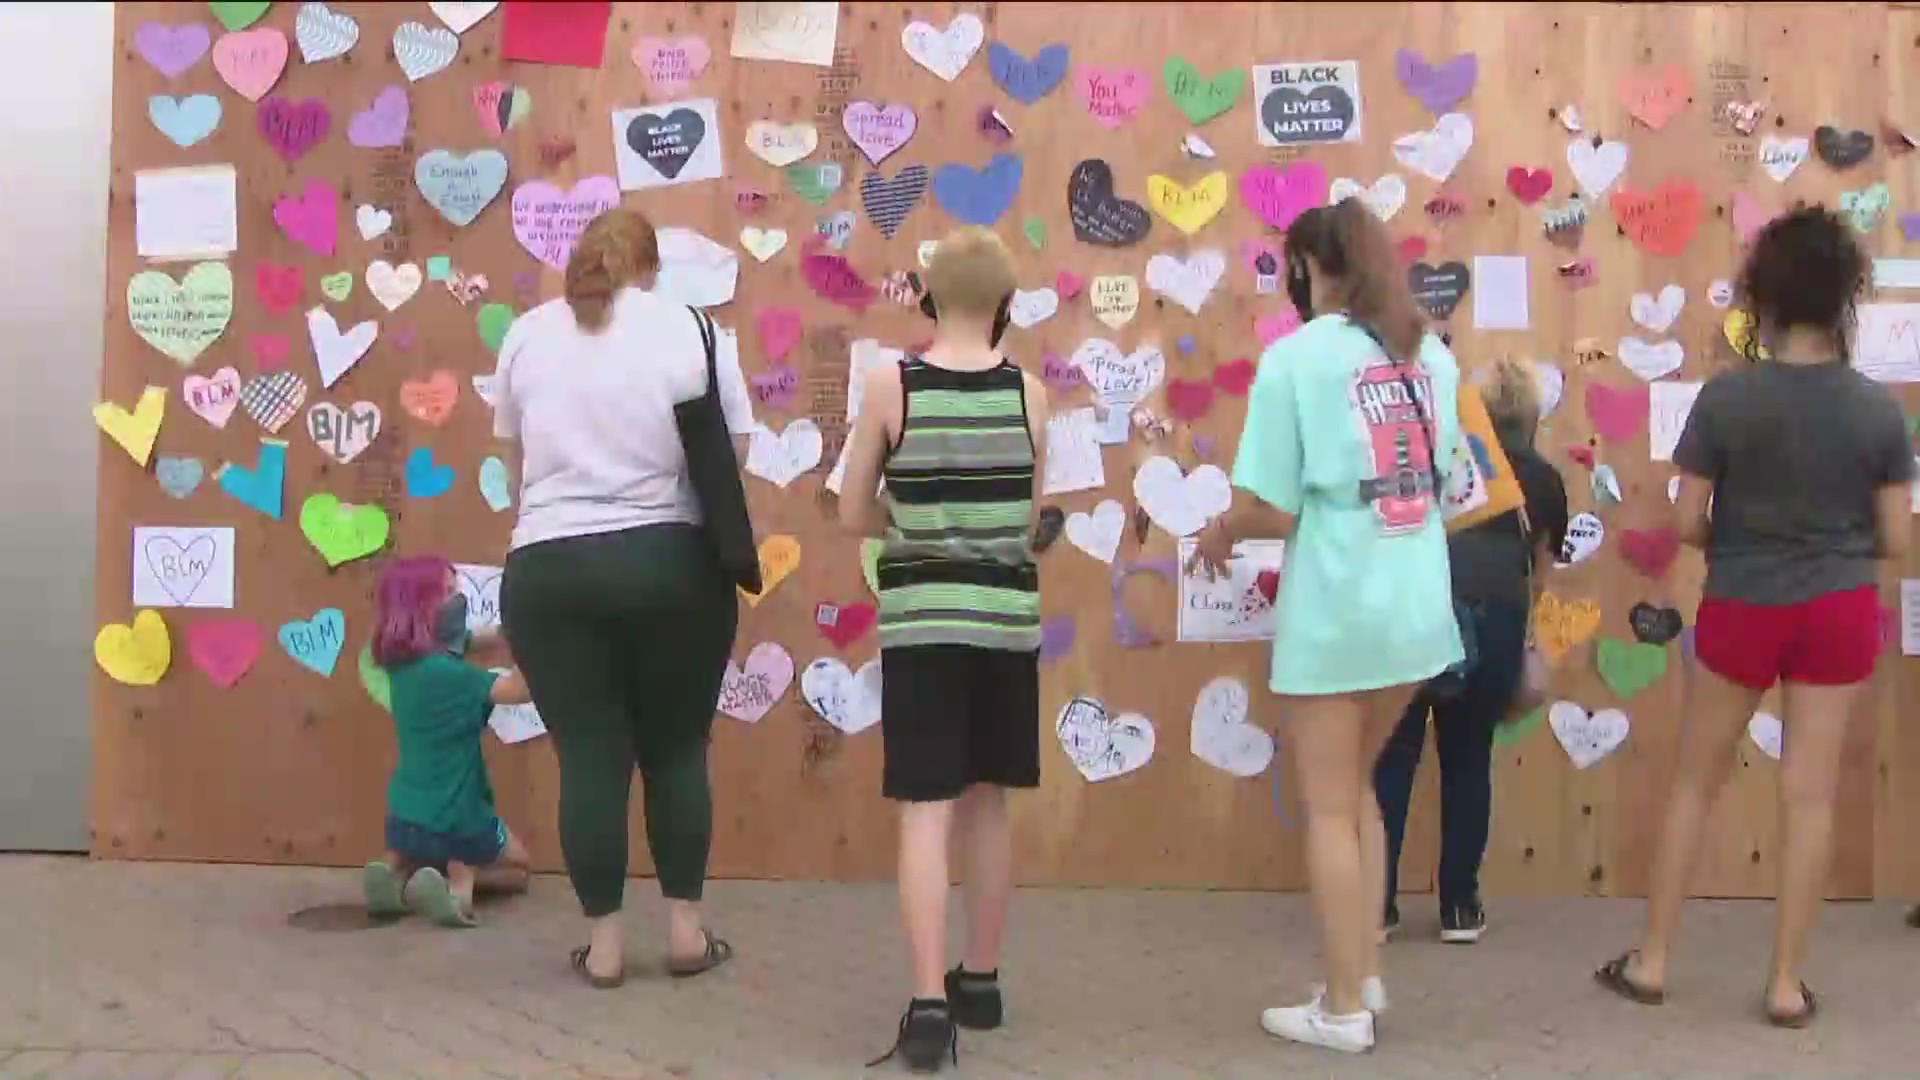 neighbors hang hearts in Naperville